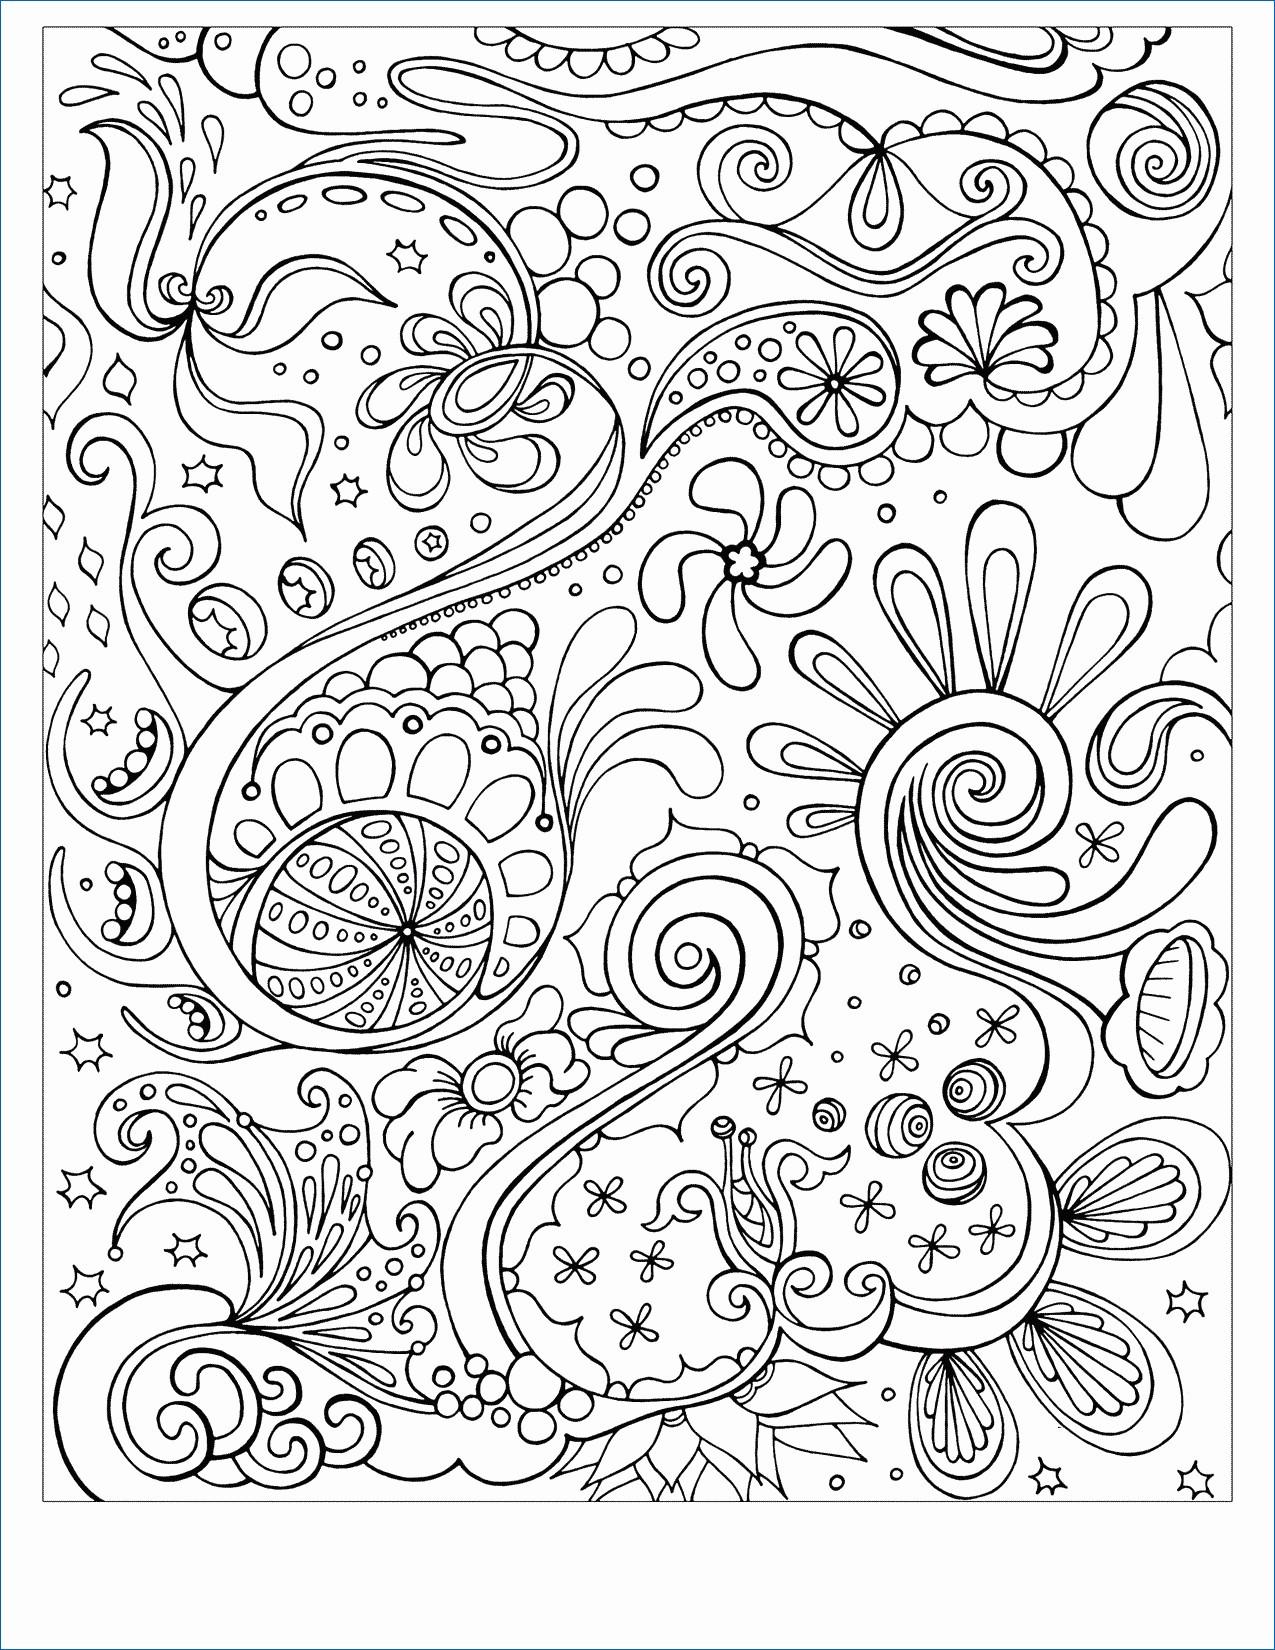 Mia and Me Coloring Pages Frisch Coloring for Me Best 40 Mia Me Ausmalbilder Scoredatscore Stock